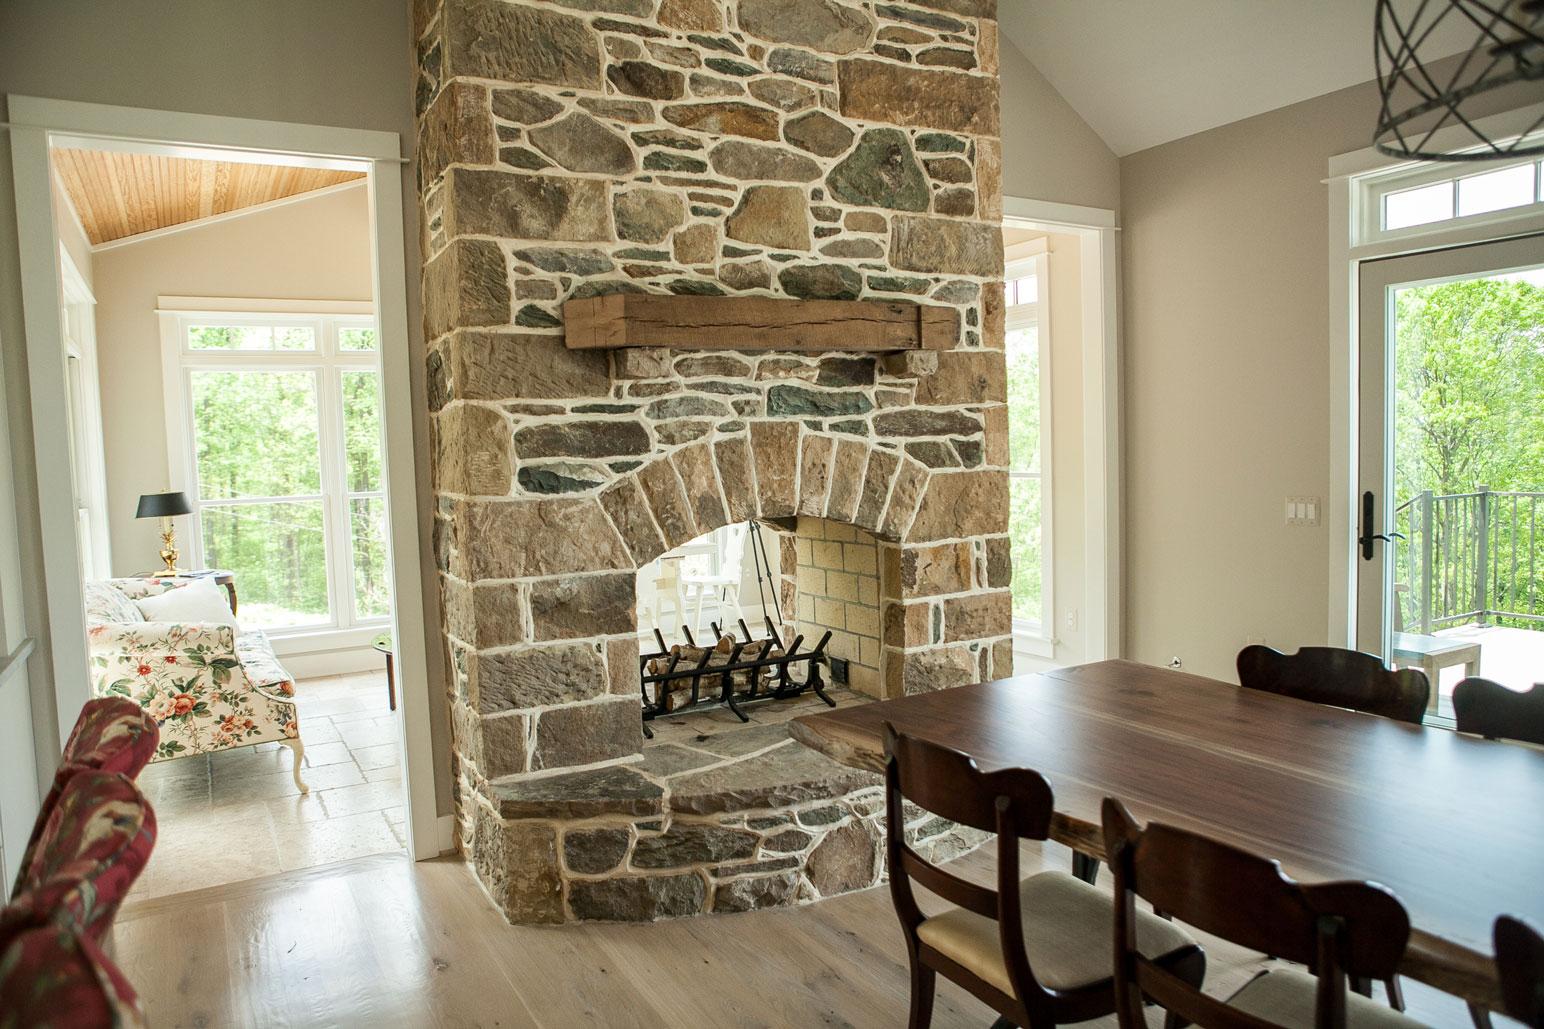 Masonry fireplaces loudoun county kelley 39 s masonry for Through fireplace